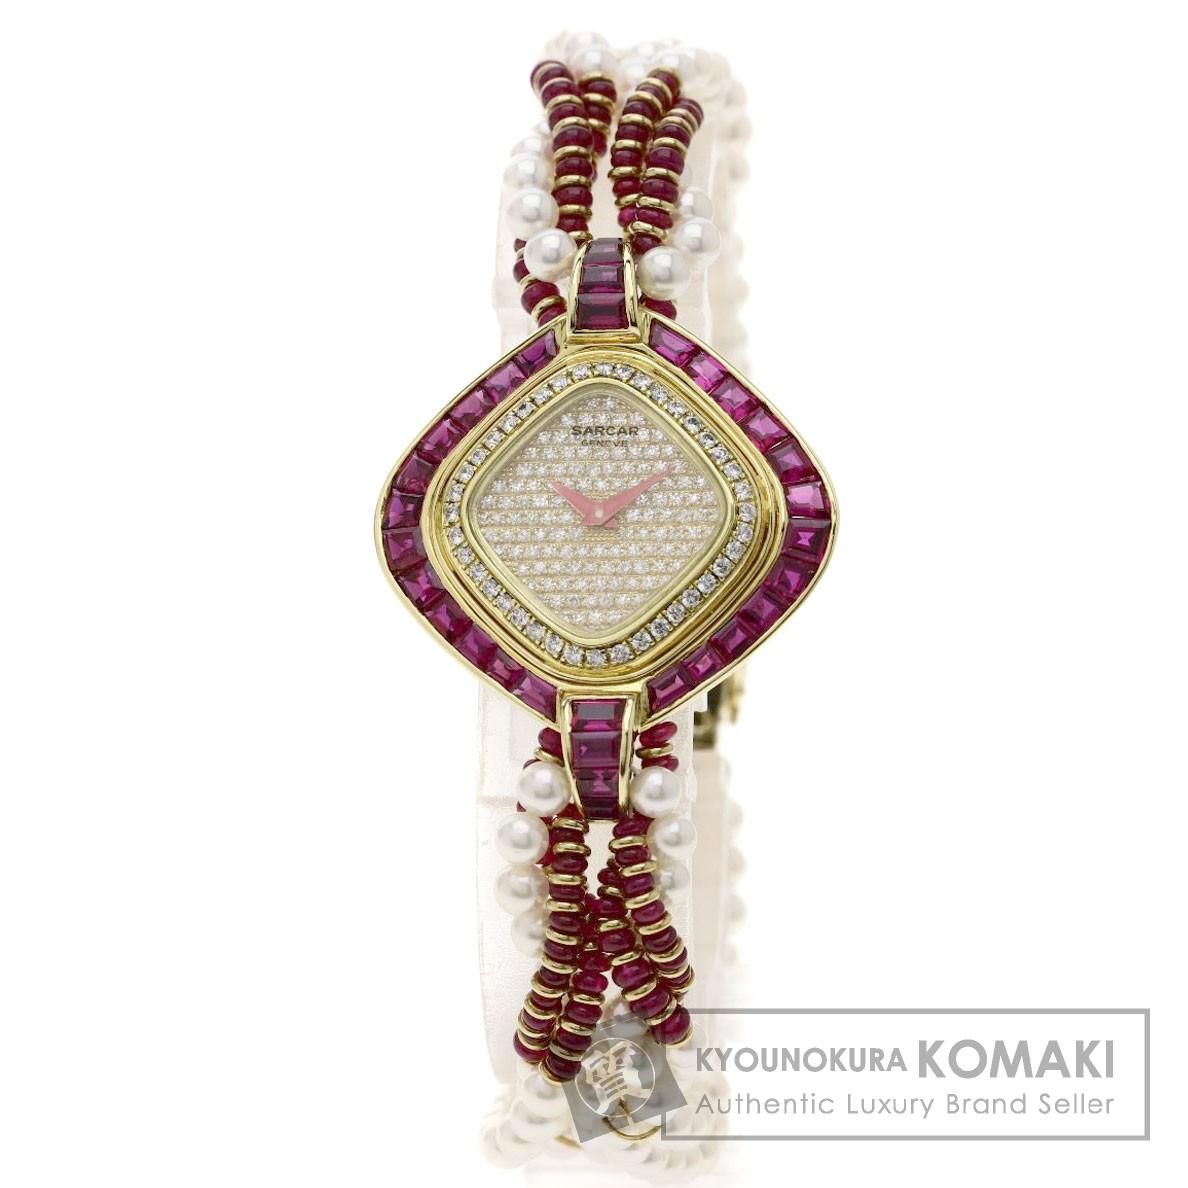 SARCAR パール/真珠/ダイヤモンド/ルビー 腕時計 K18イエローゴールド レディース 【中古】【サーカー】